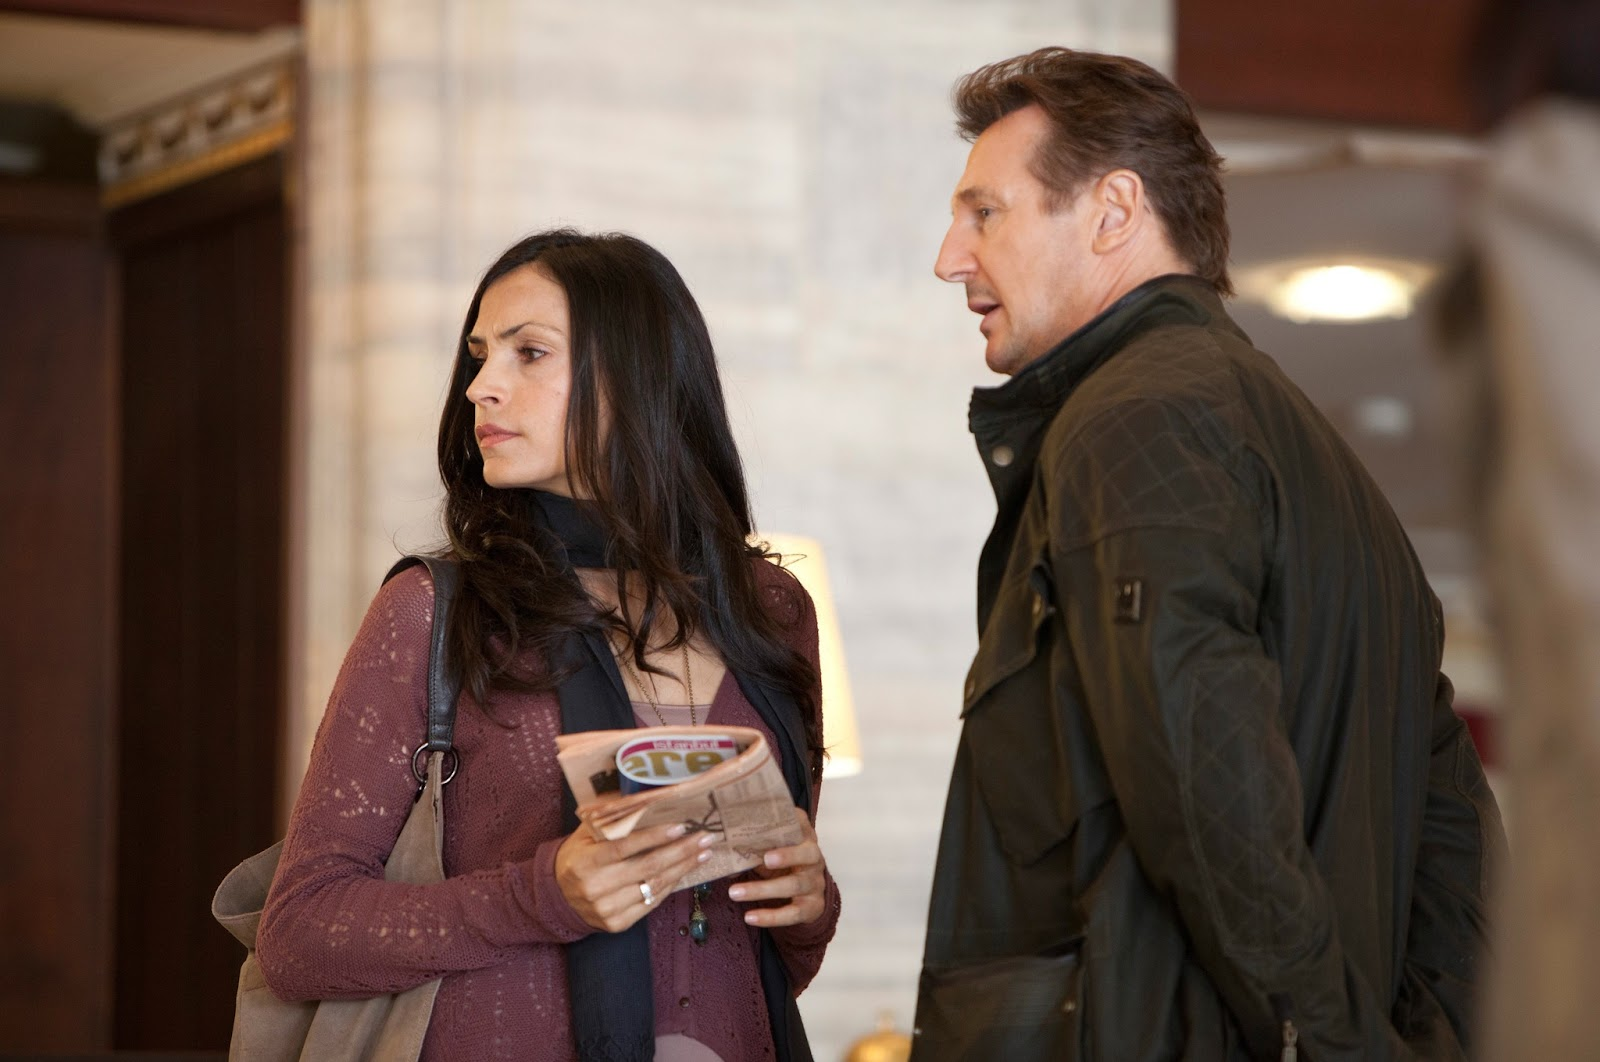 http://3.bp.blogspot.com/-6zu2otbHozU/UHIlUg6EicI/AAAAAAABBts/7qy8B2GDyQE/s1600/Taken_2-Liam_Neeson-Maggie_Grace-Famke_Janssen-001.jpg